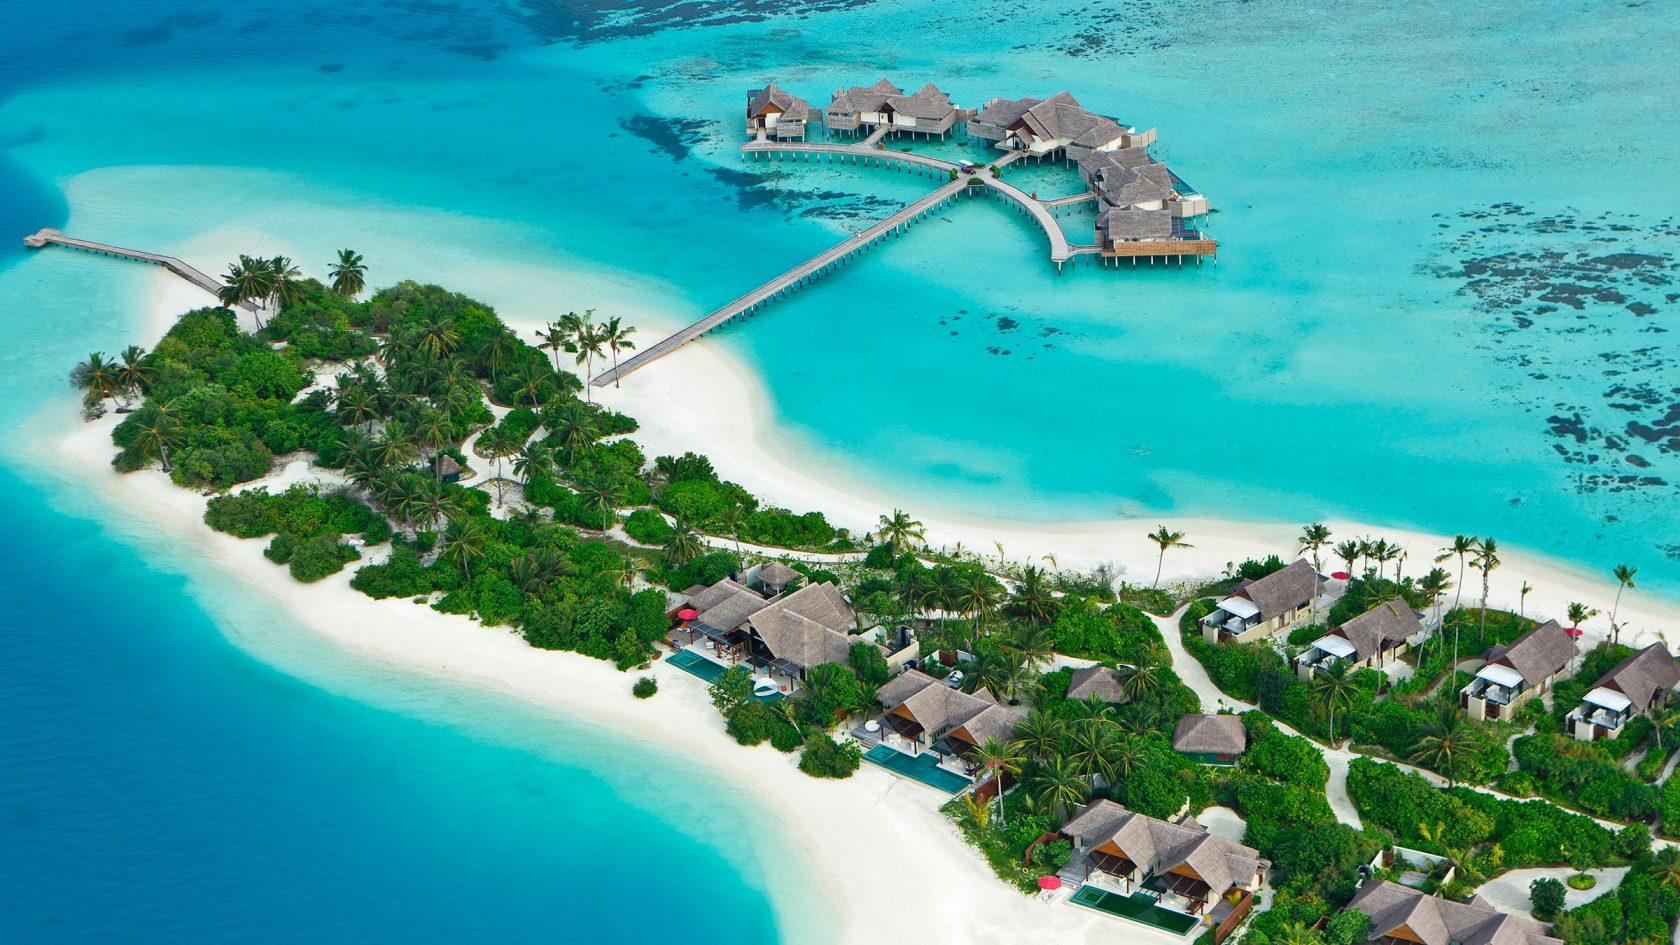 Niyama Island Resort Maldives